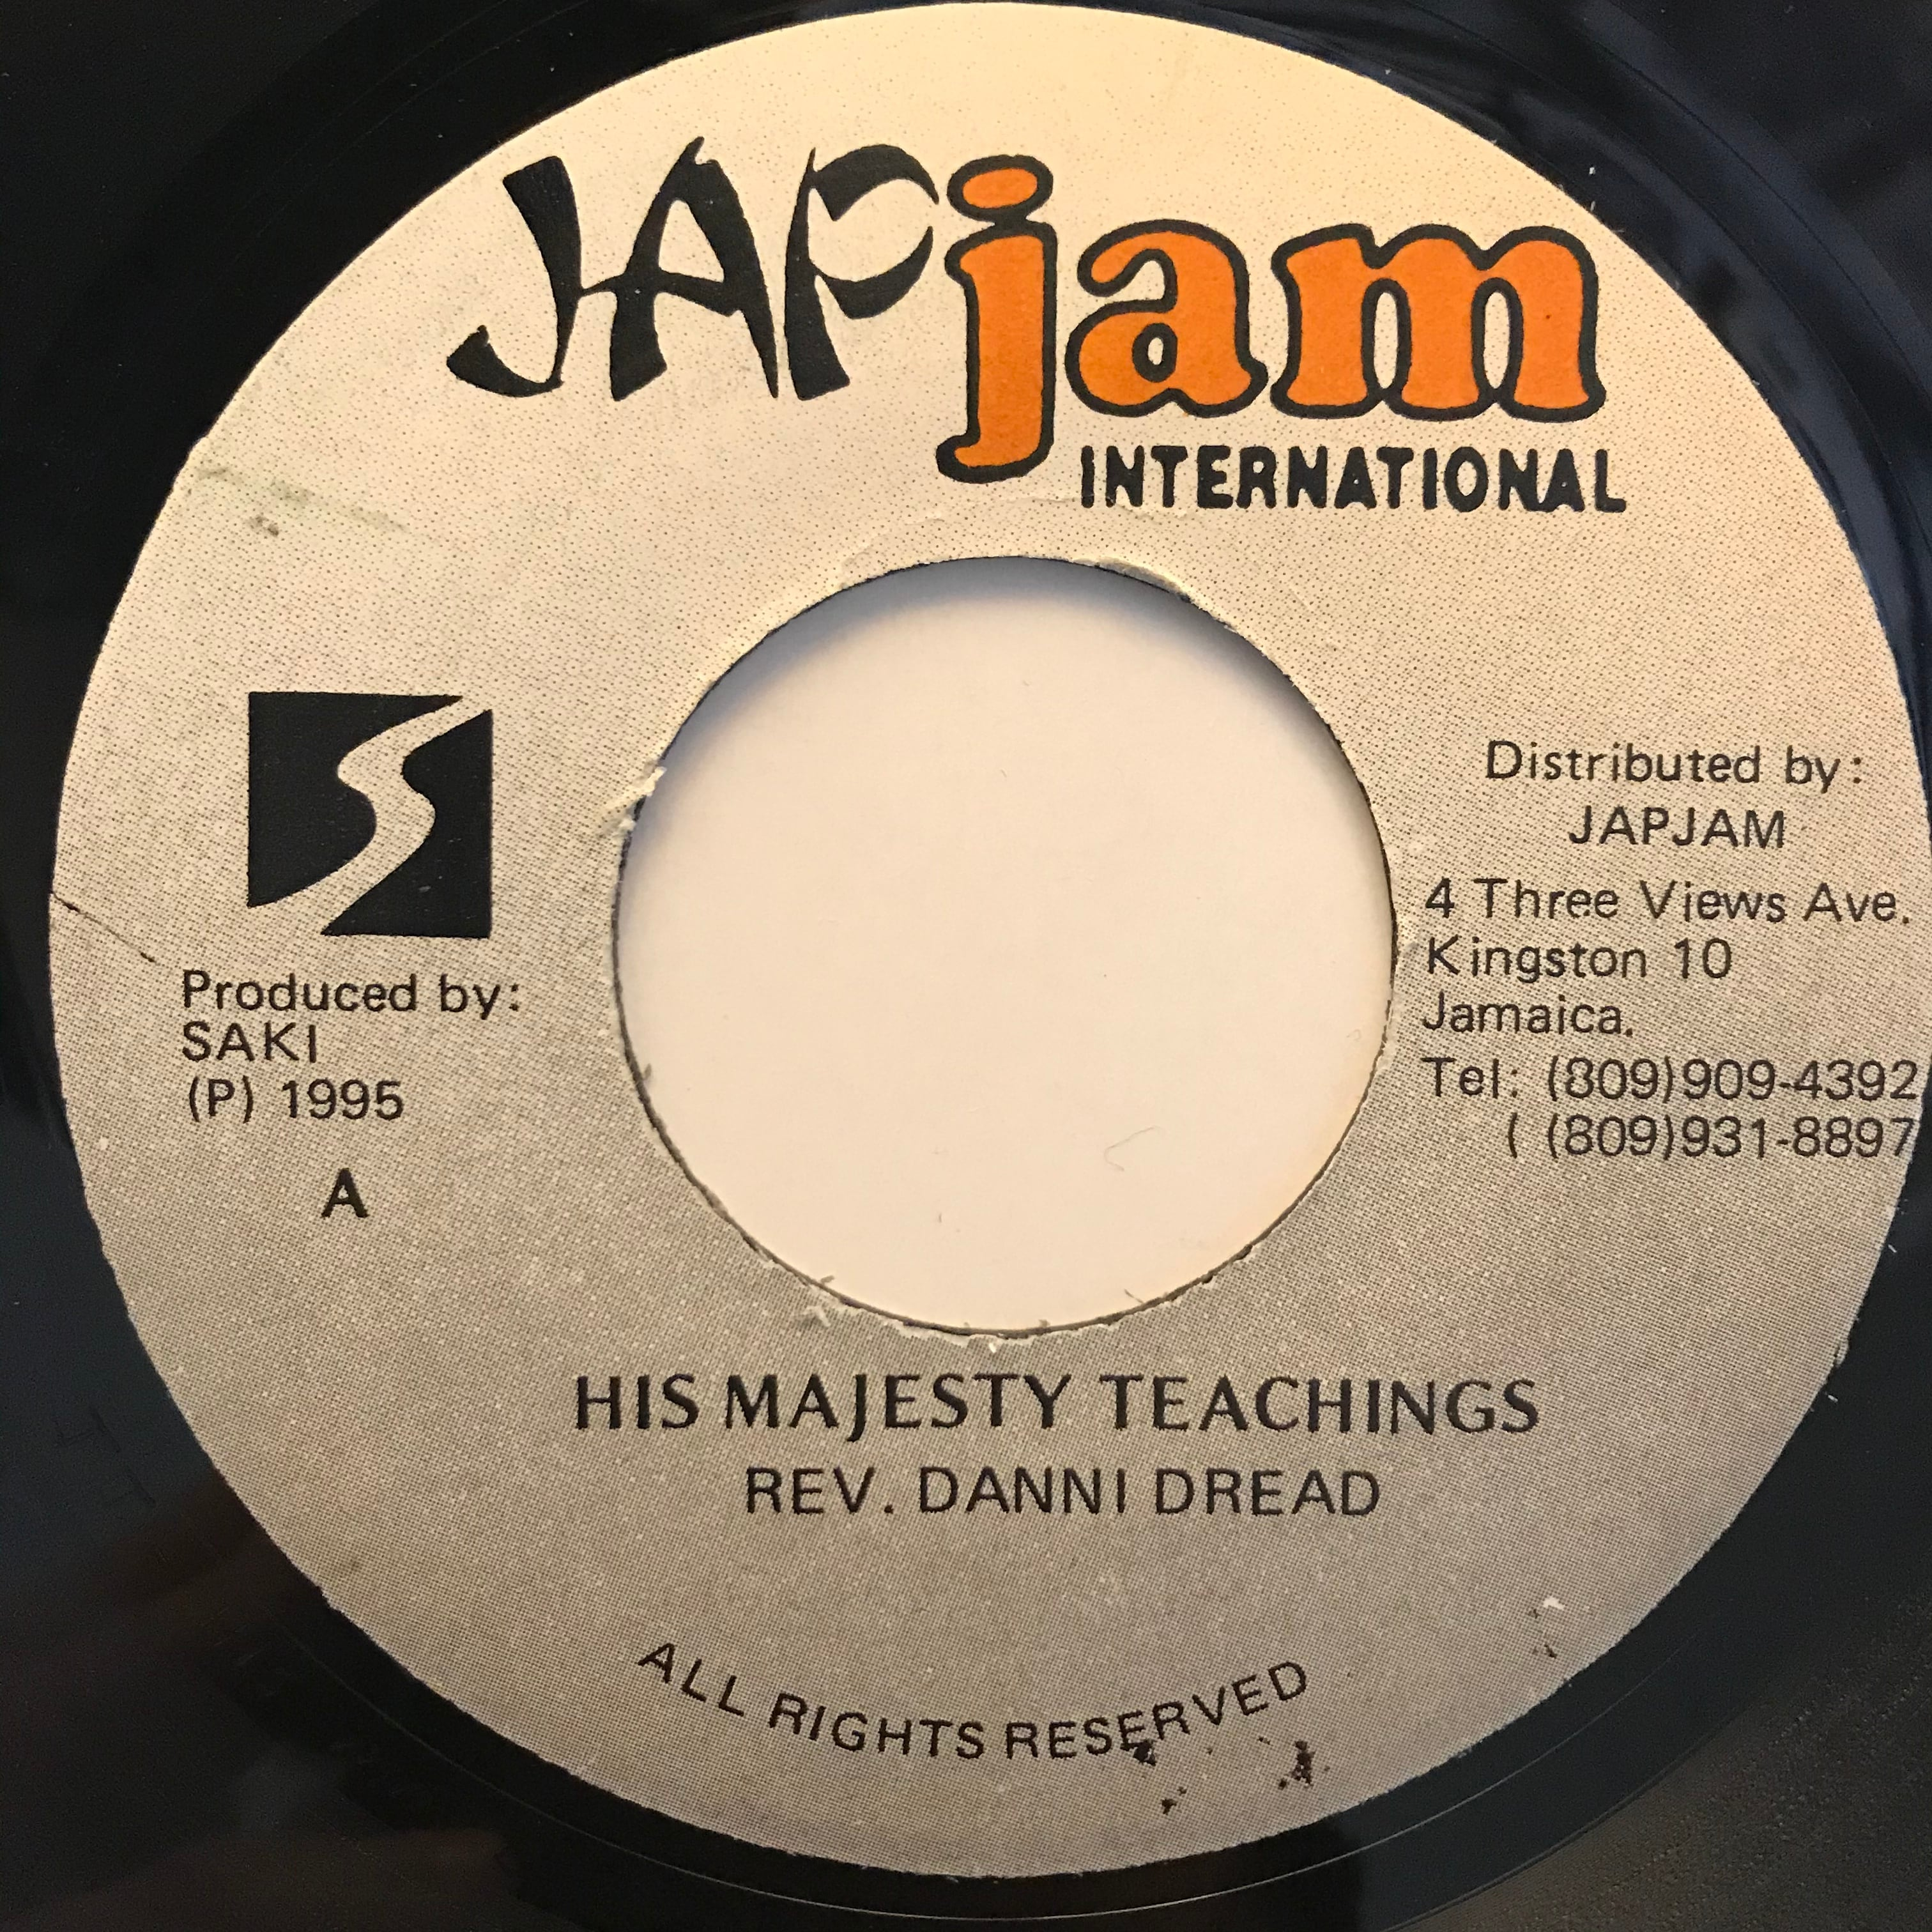 Danni Dread - His Majesty Teachings【7-10809】